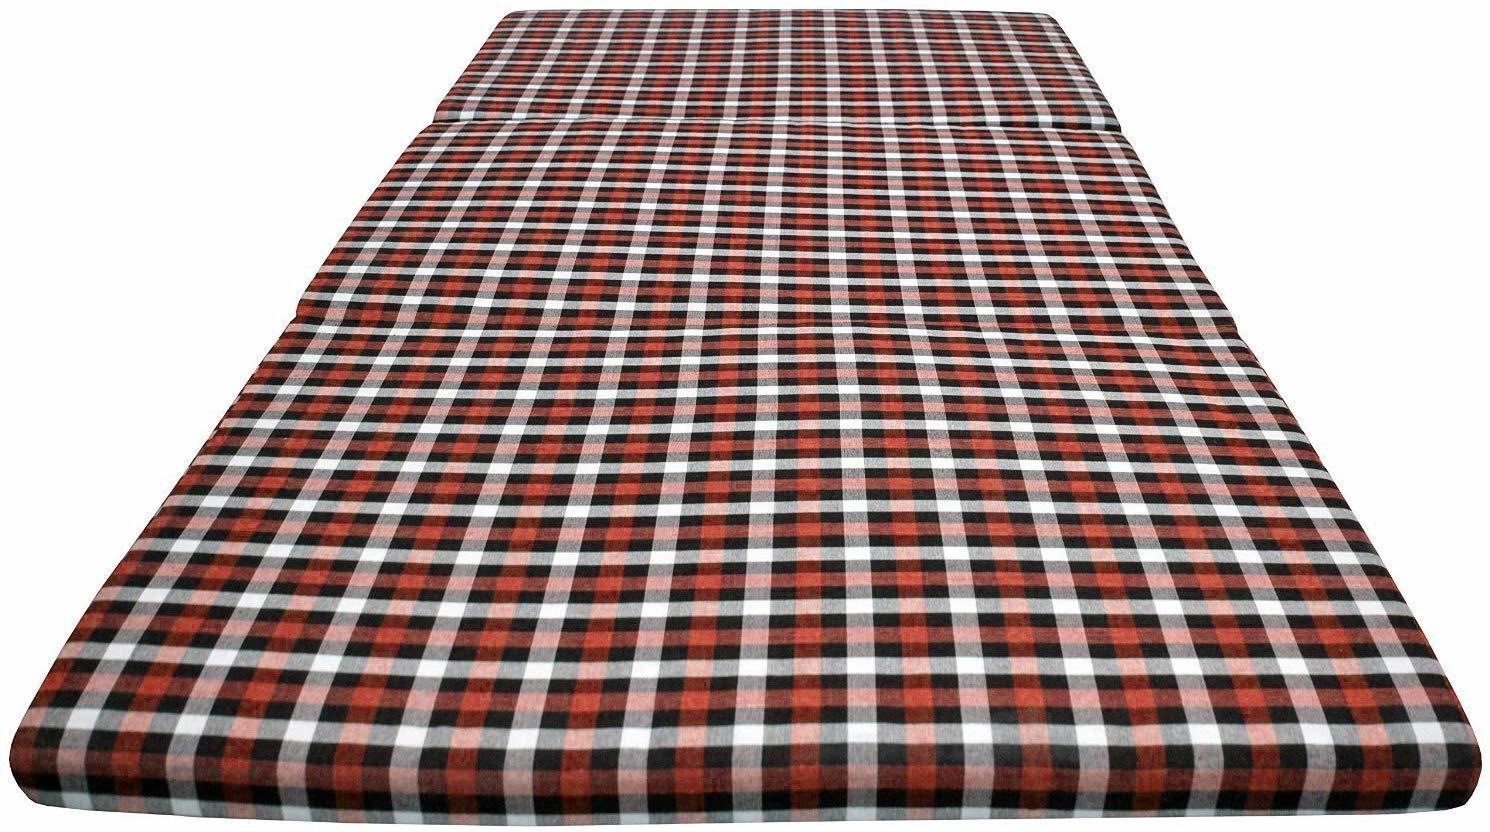 Satcap India 3 fold folding mattress (72